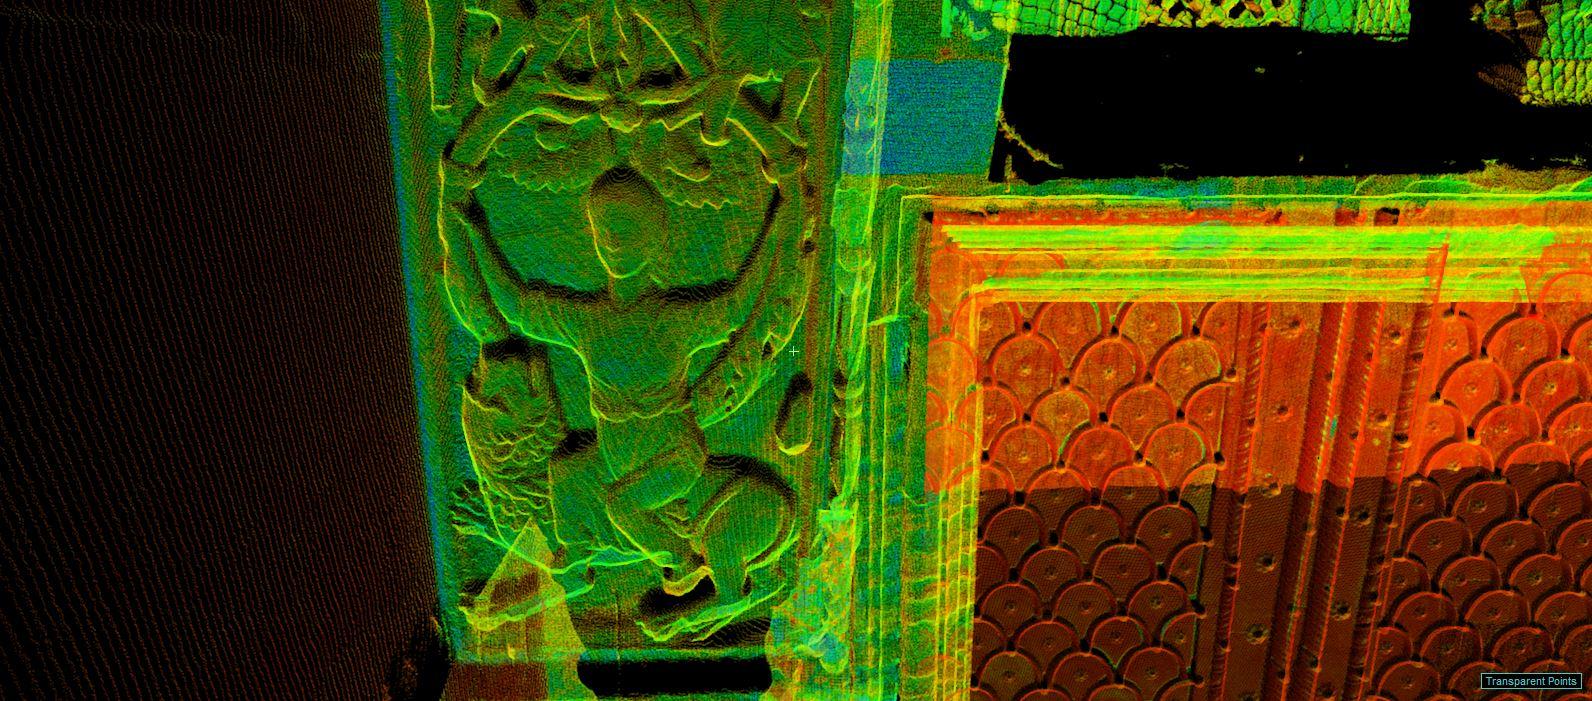 Venezia Basilica di San Marco-laser scanner-modellazione 3De X.JPG